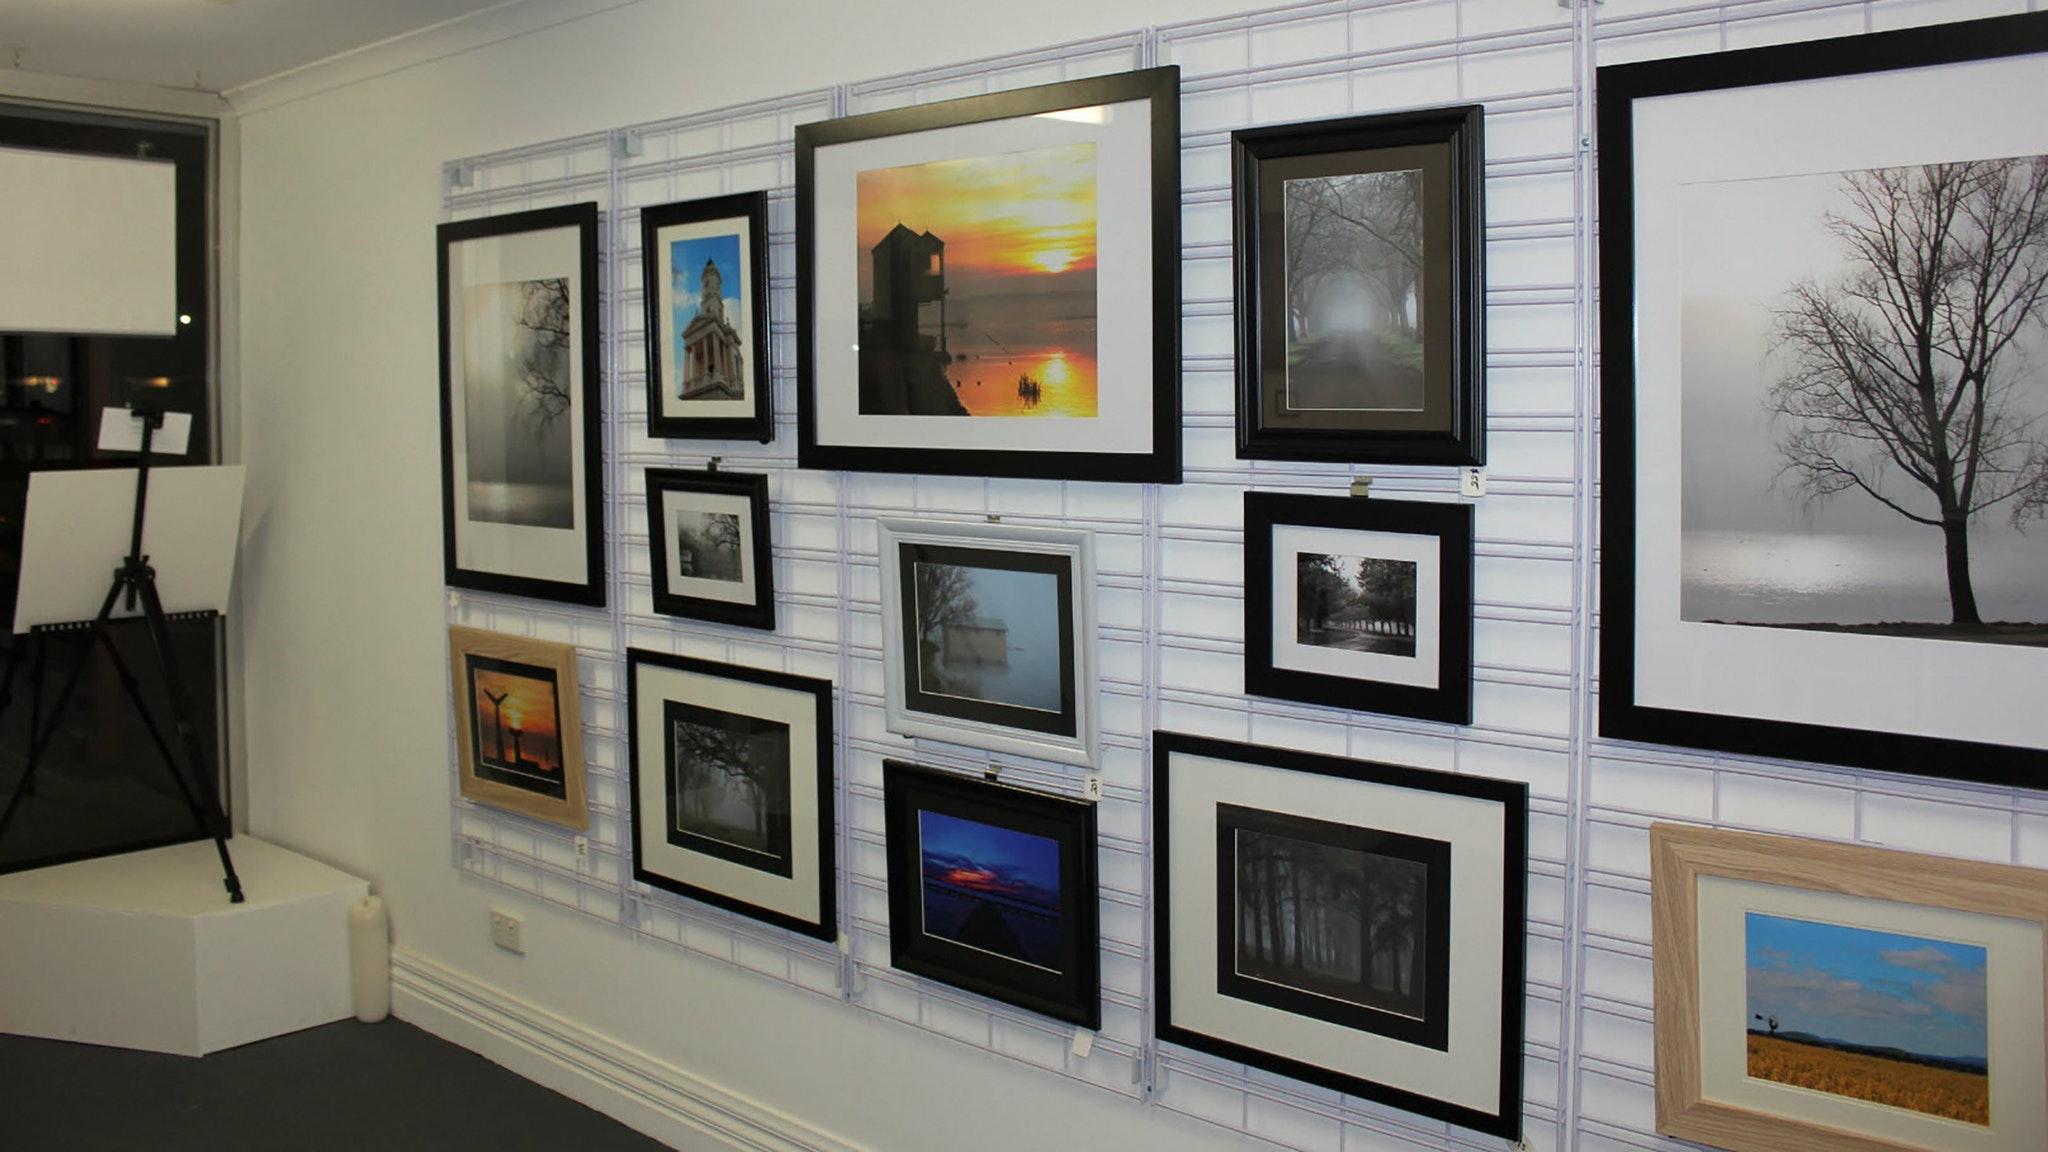 Ballart Image Gallery and The Ballarat Shop